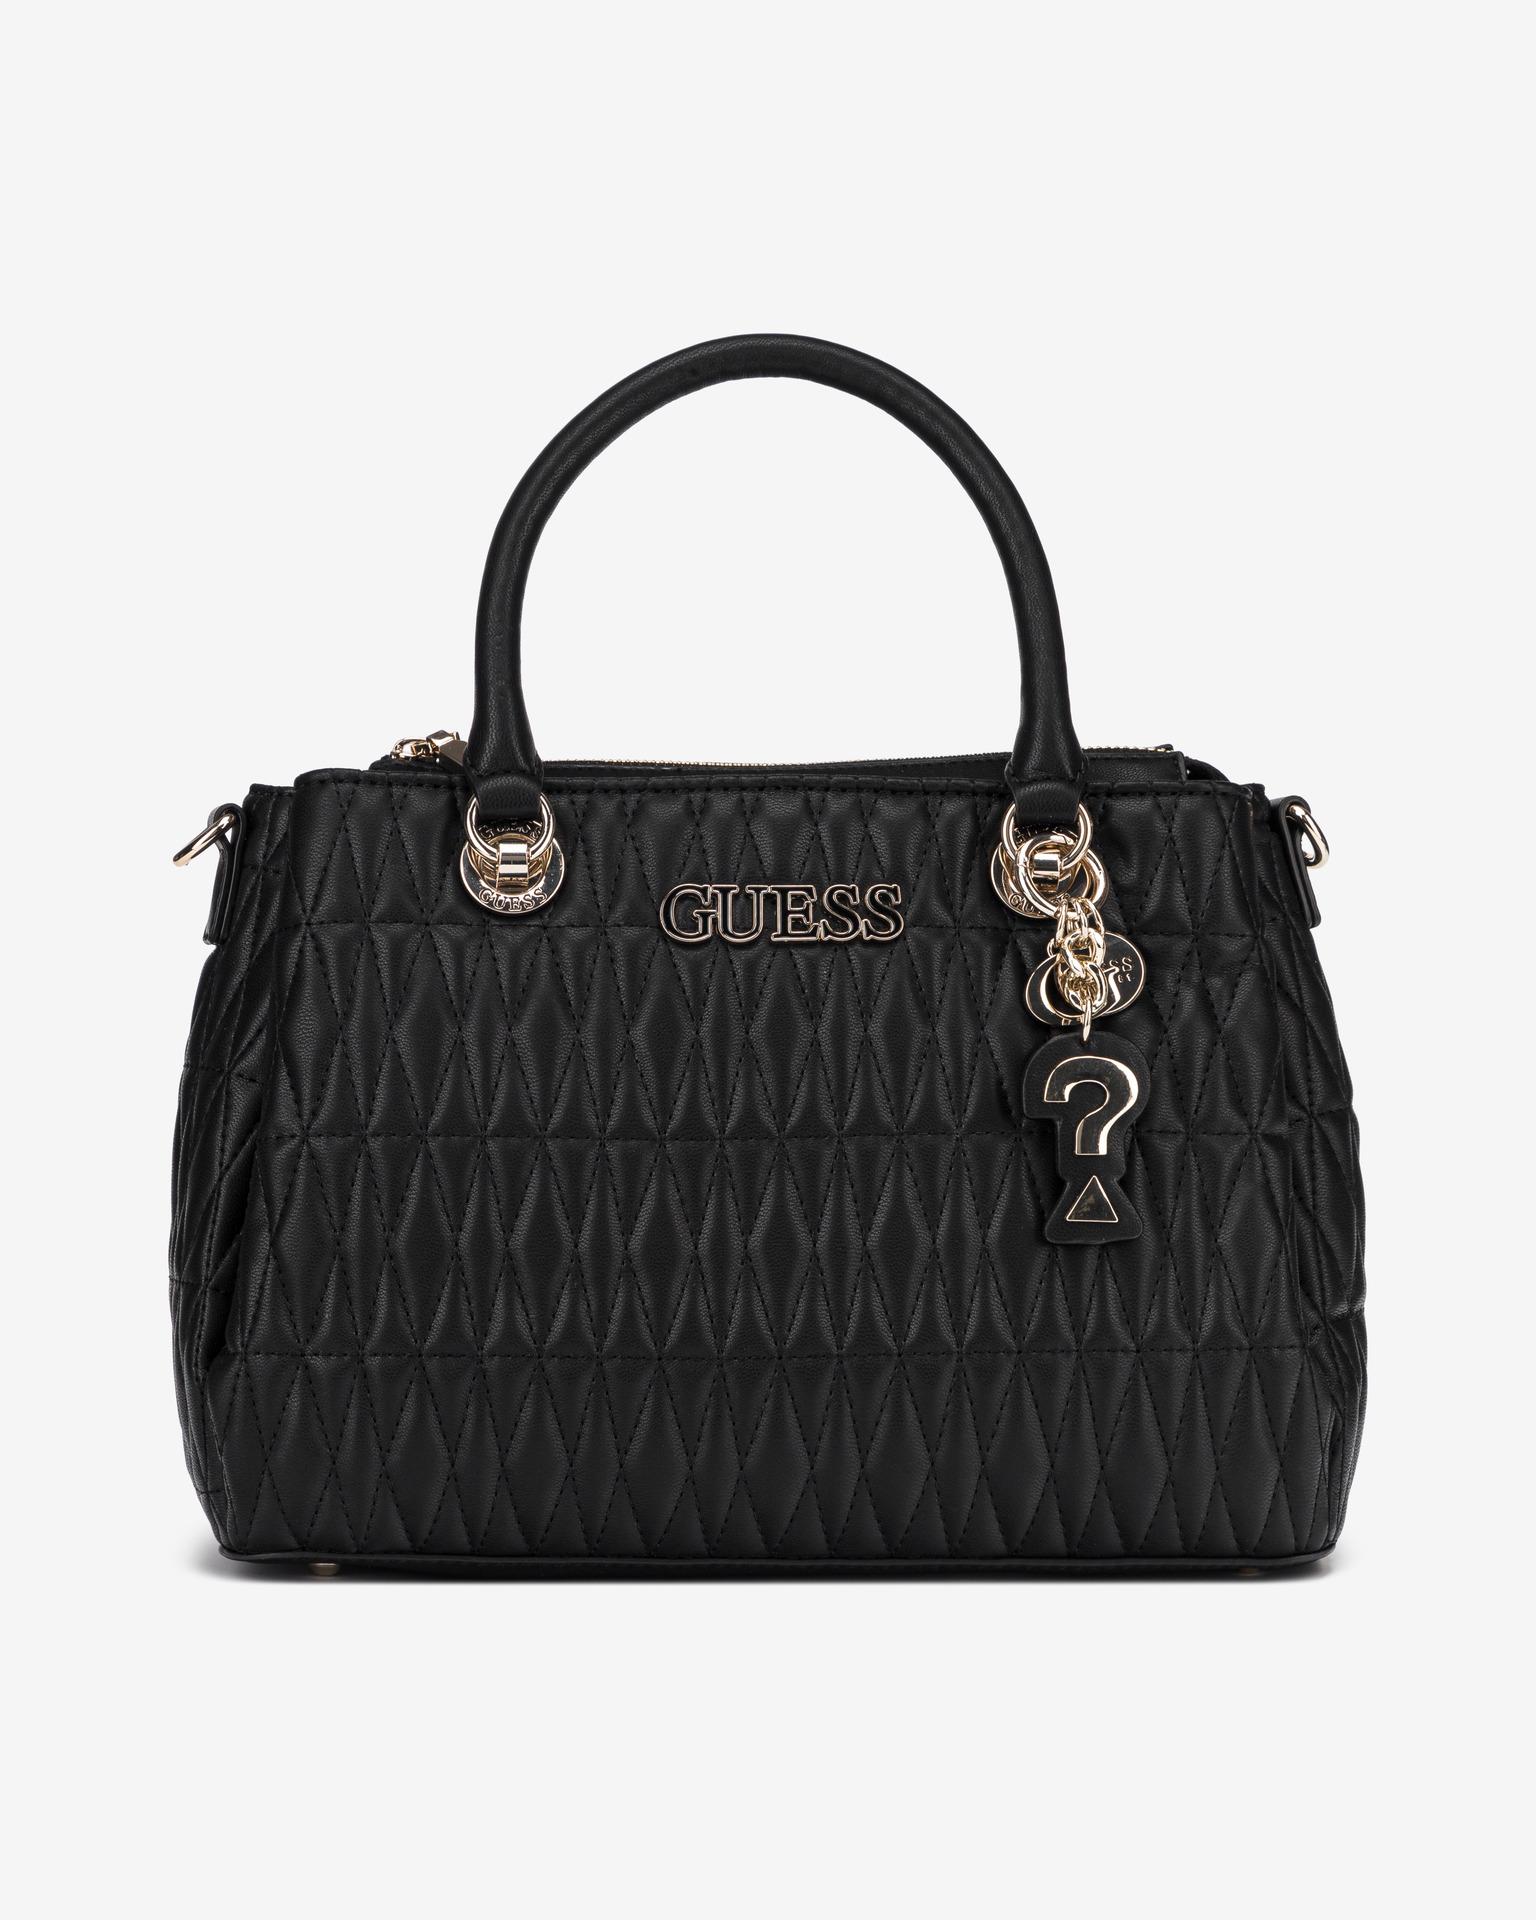 Guess black handbag Brinkley